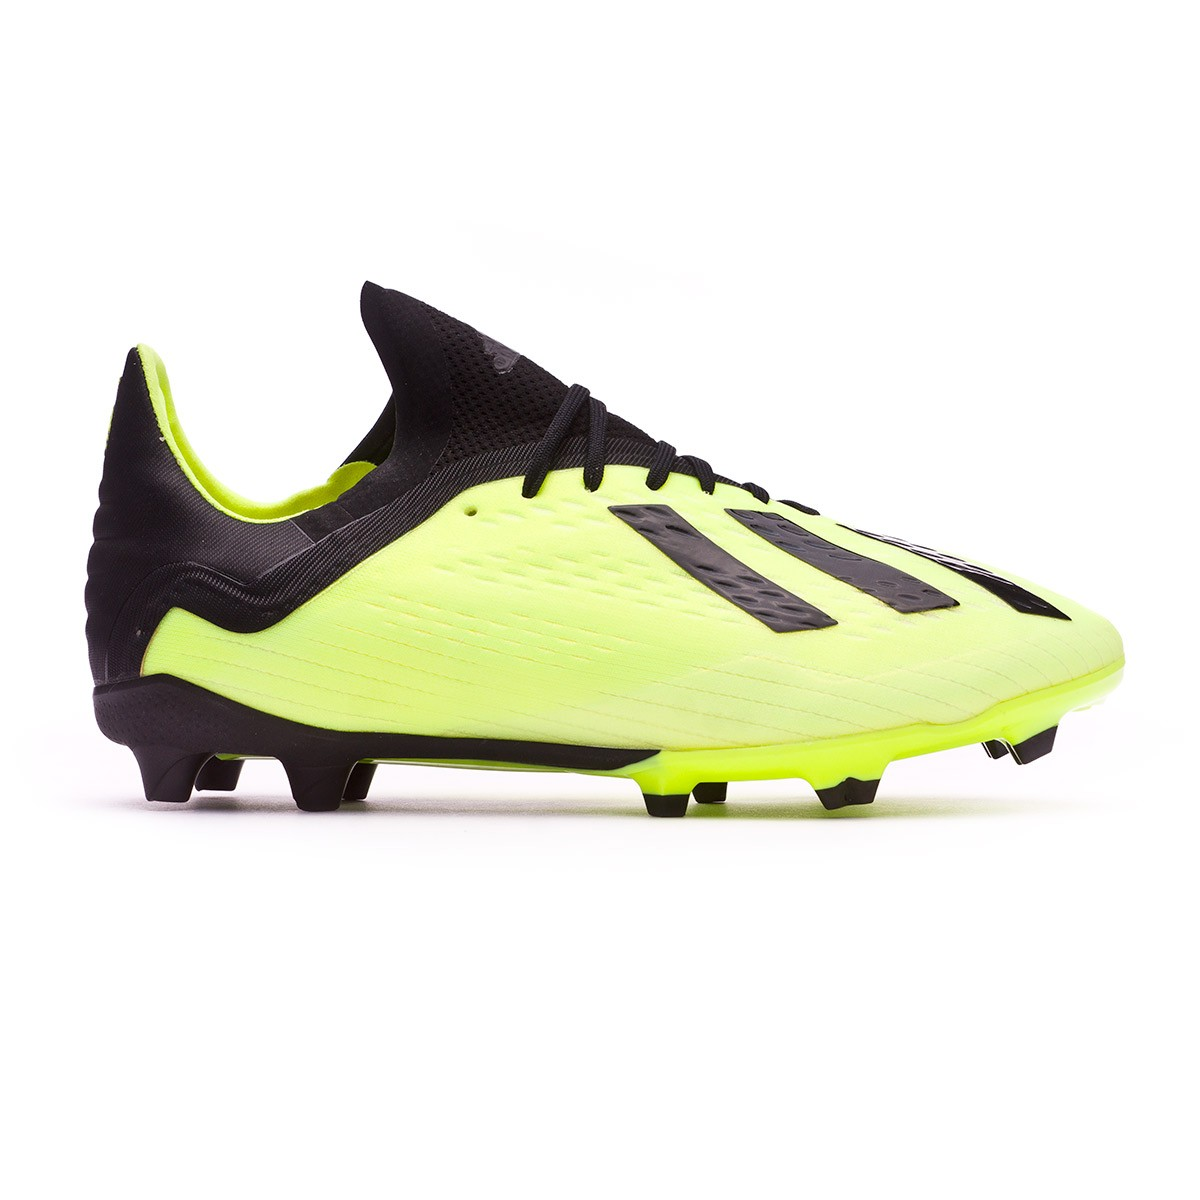 a17902ed6 Football Boots adidas Kids X 18.1 FG Solar yellow-Core black-White - Tienda  de fútbol Fútbol Emotion